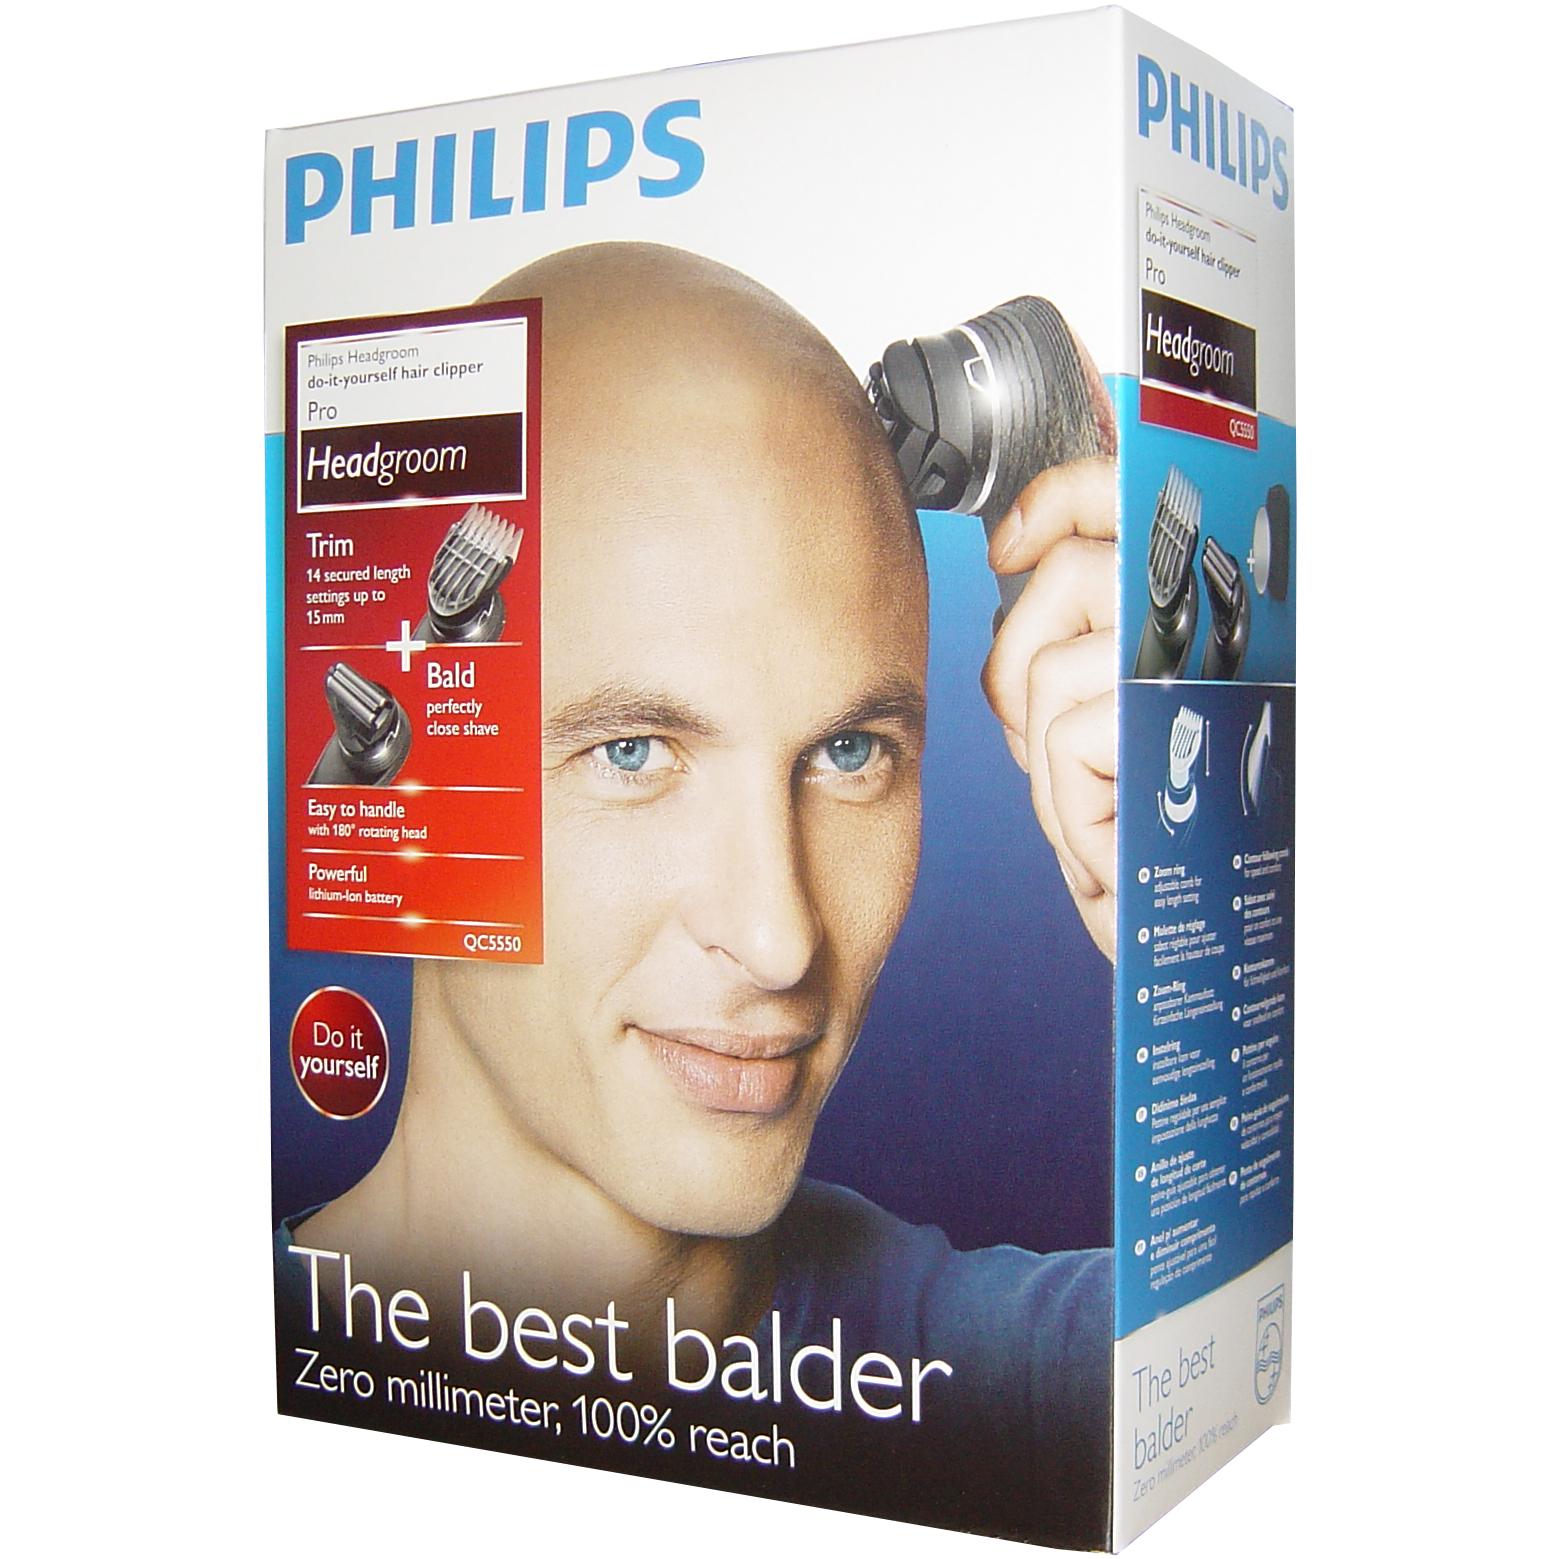 Philips qc5550 clipper elf international ltd philips qc5550 clipper solutioingenieria Image collections